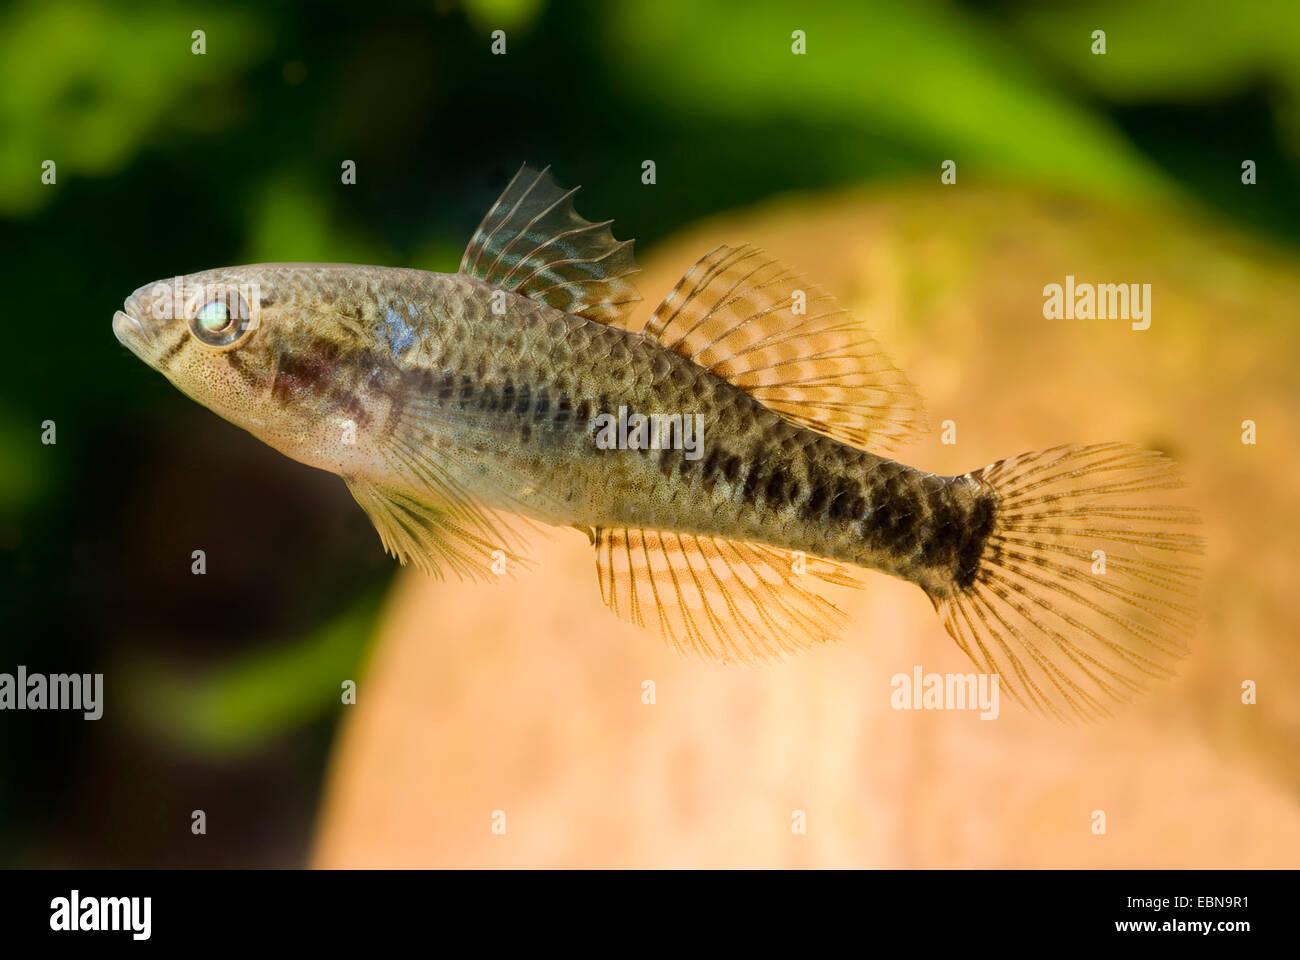 Brackish water fish stock photos brackish water fish for Brackish water fish